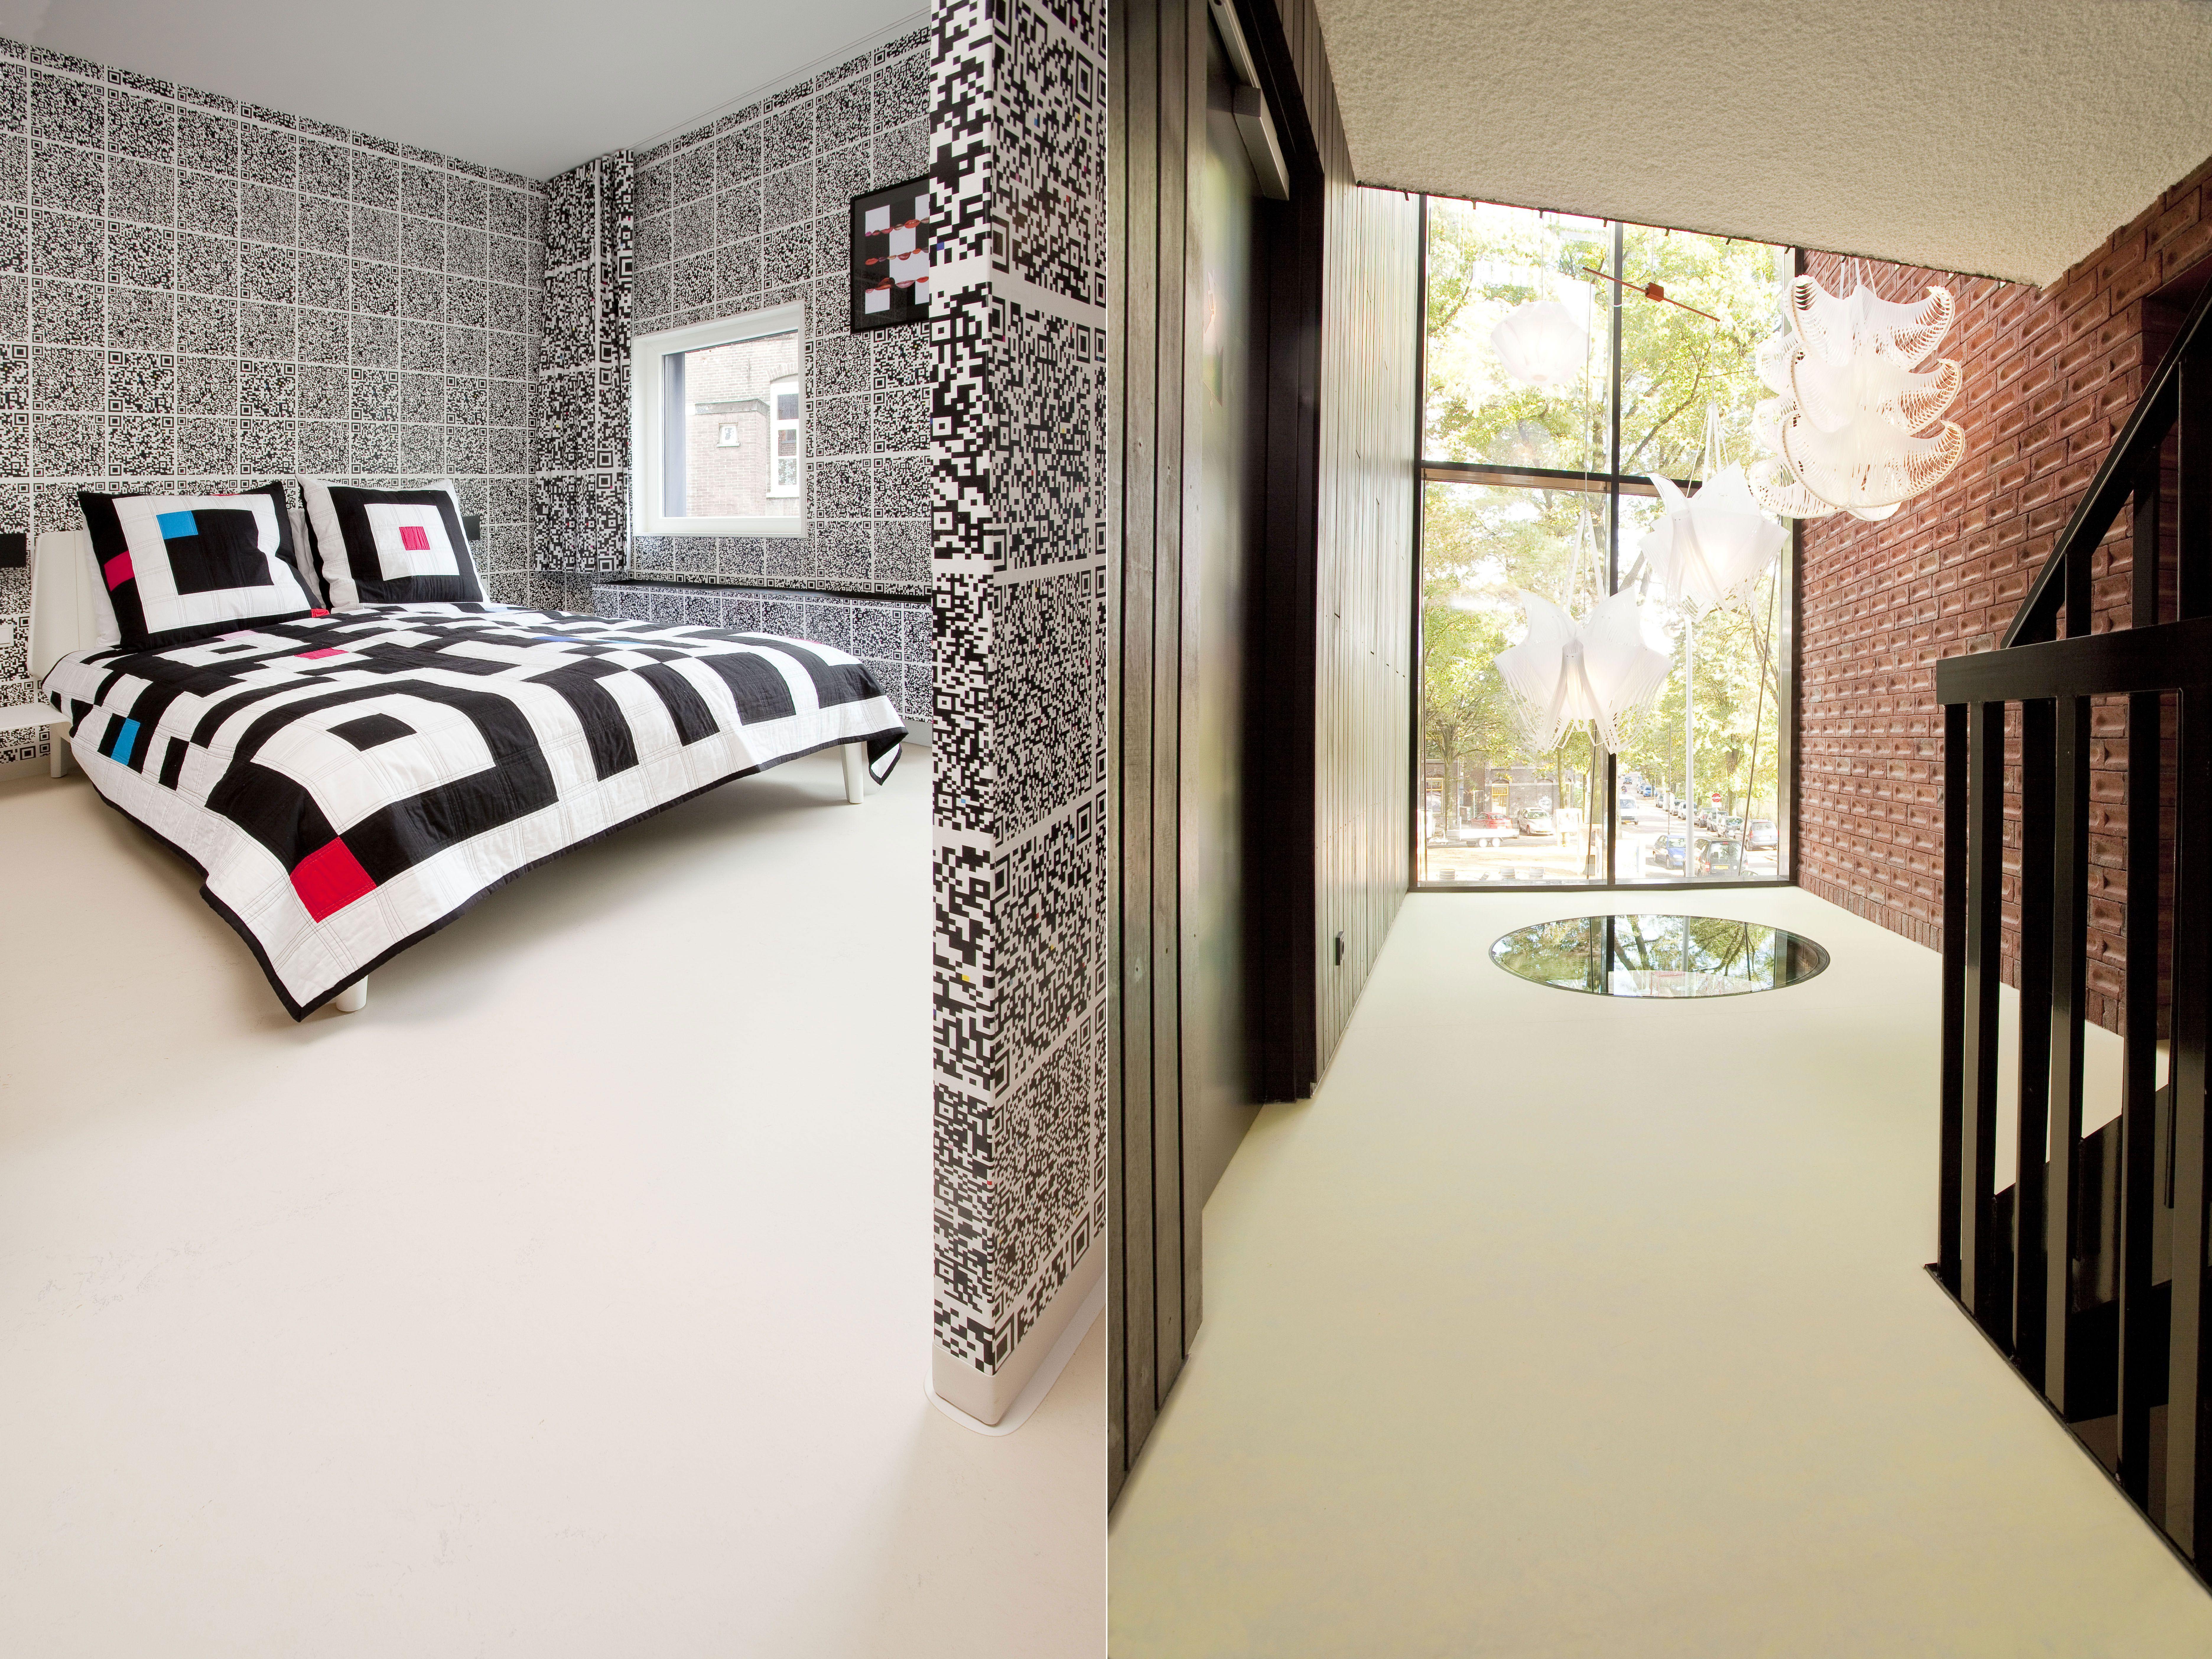 modez mode design hotel arnhem the netherlands interior designer piet